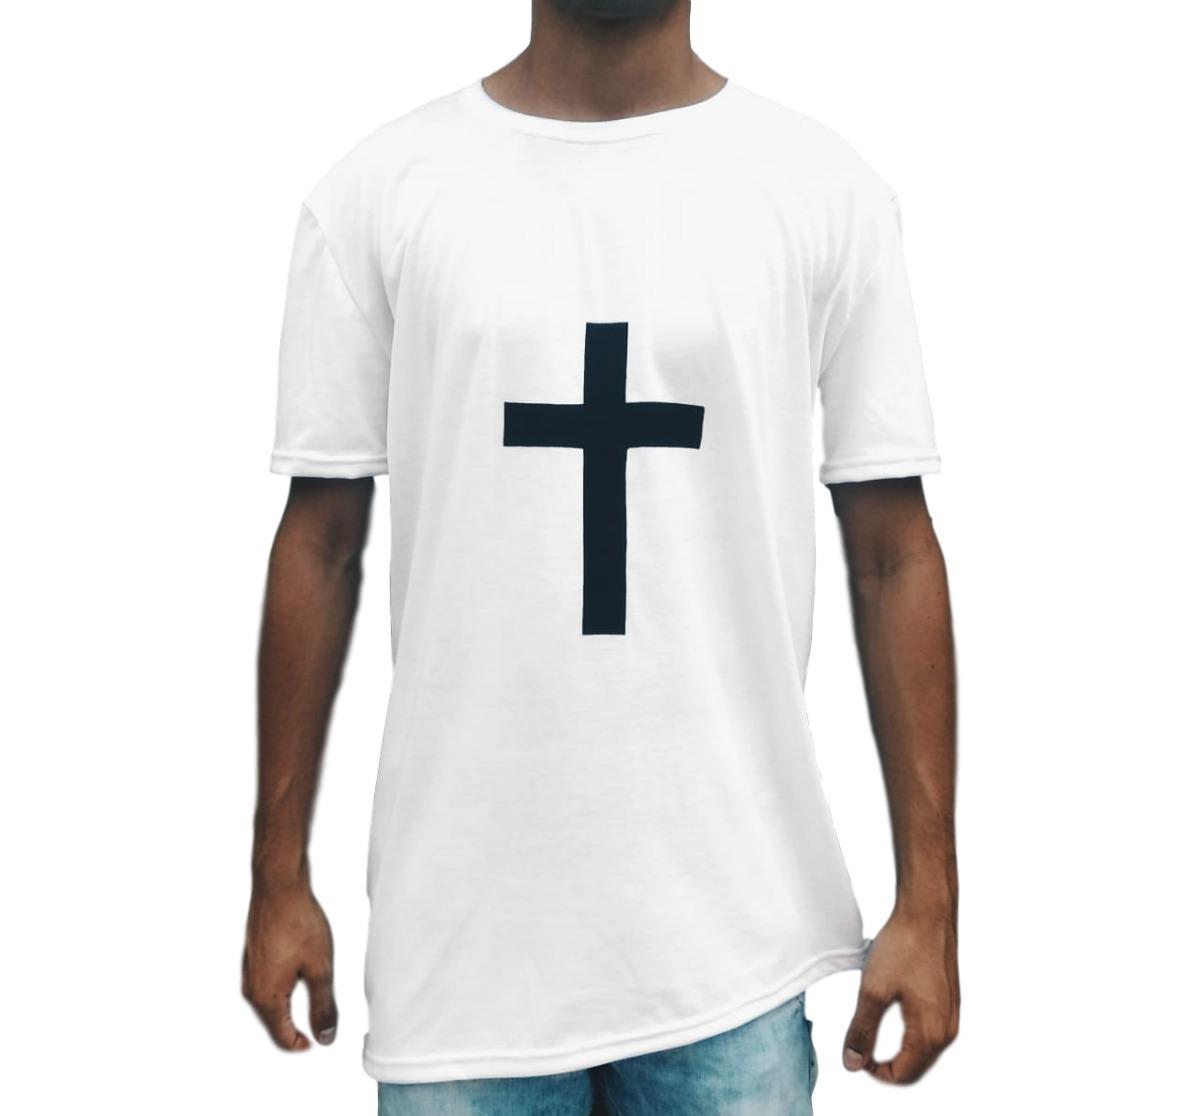 abe87bfbb camiseta swag longline oversized blusa camisa com cruz. Carregando zoom.